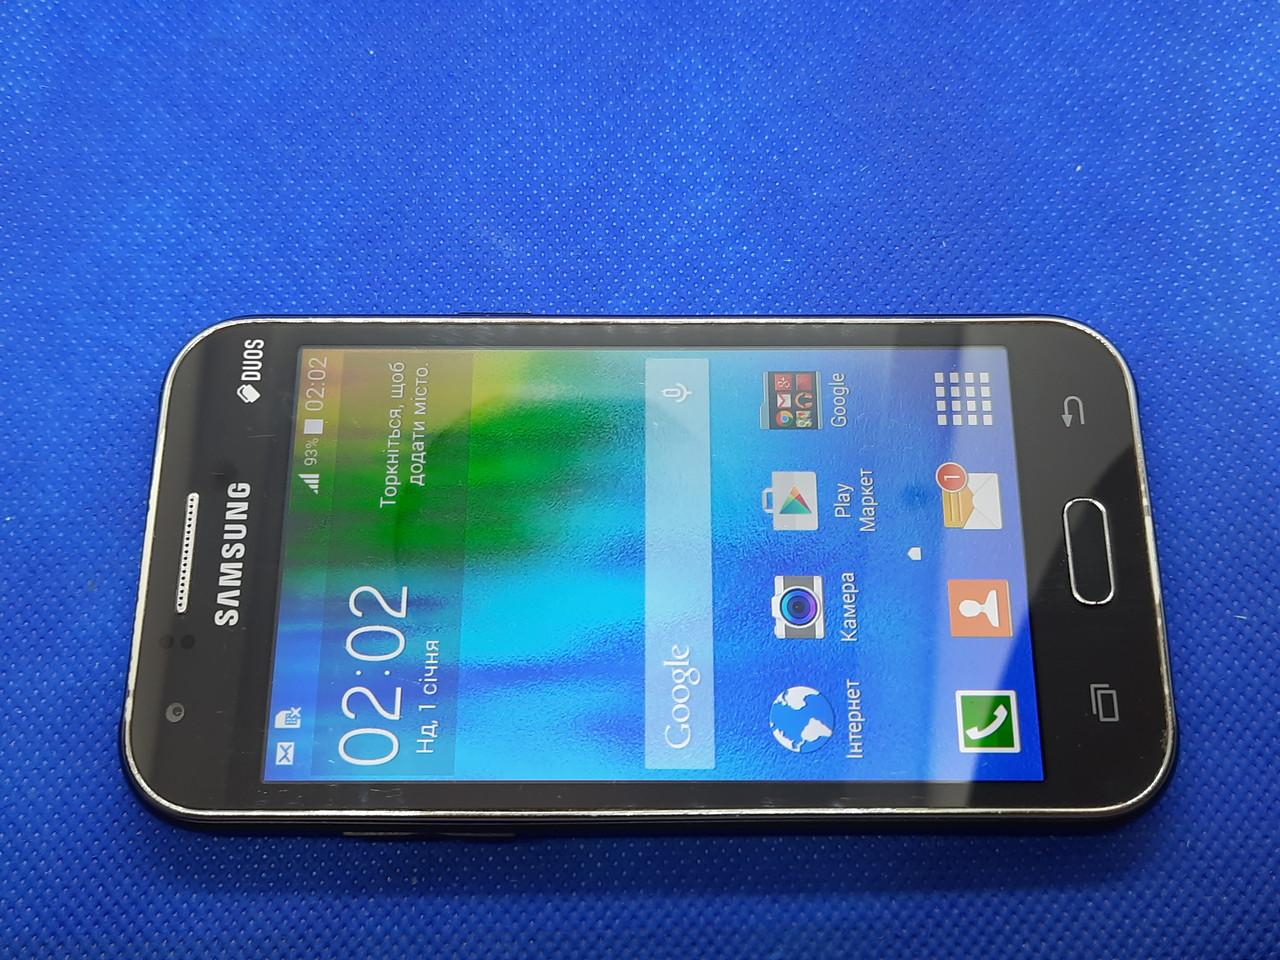 Samsung Galaxy J1 SM-J100H #1416ВР